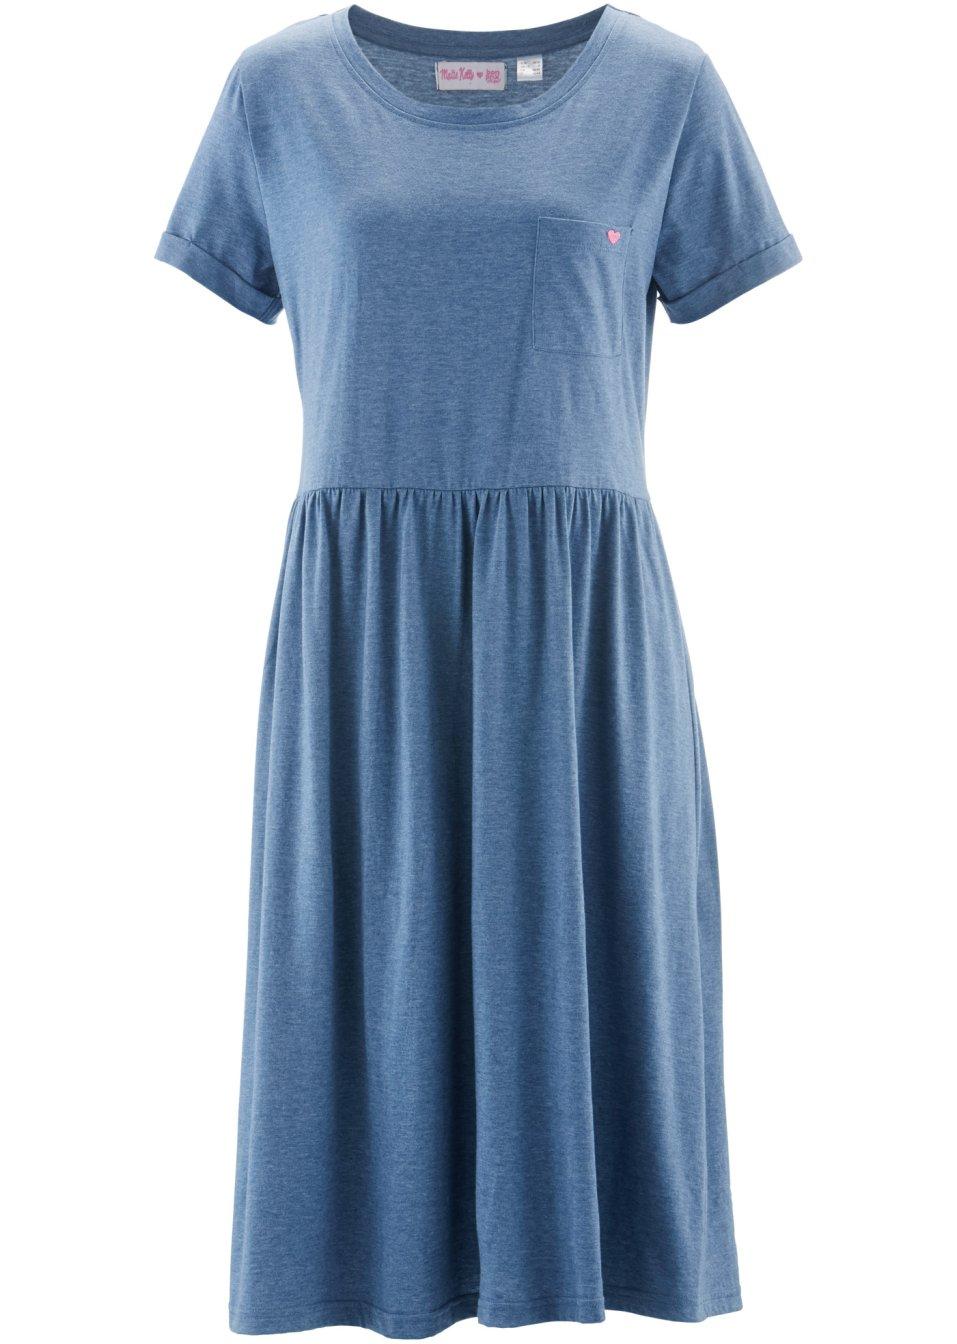 shirt kleid 1 2 arm designt von maite kelly jeansblau bpc bonprix collection online kaufen. Black Bedroom Furniture Sets. Home Design Ideas